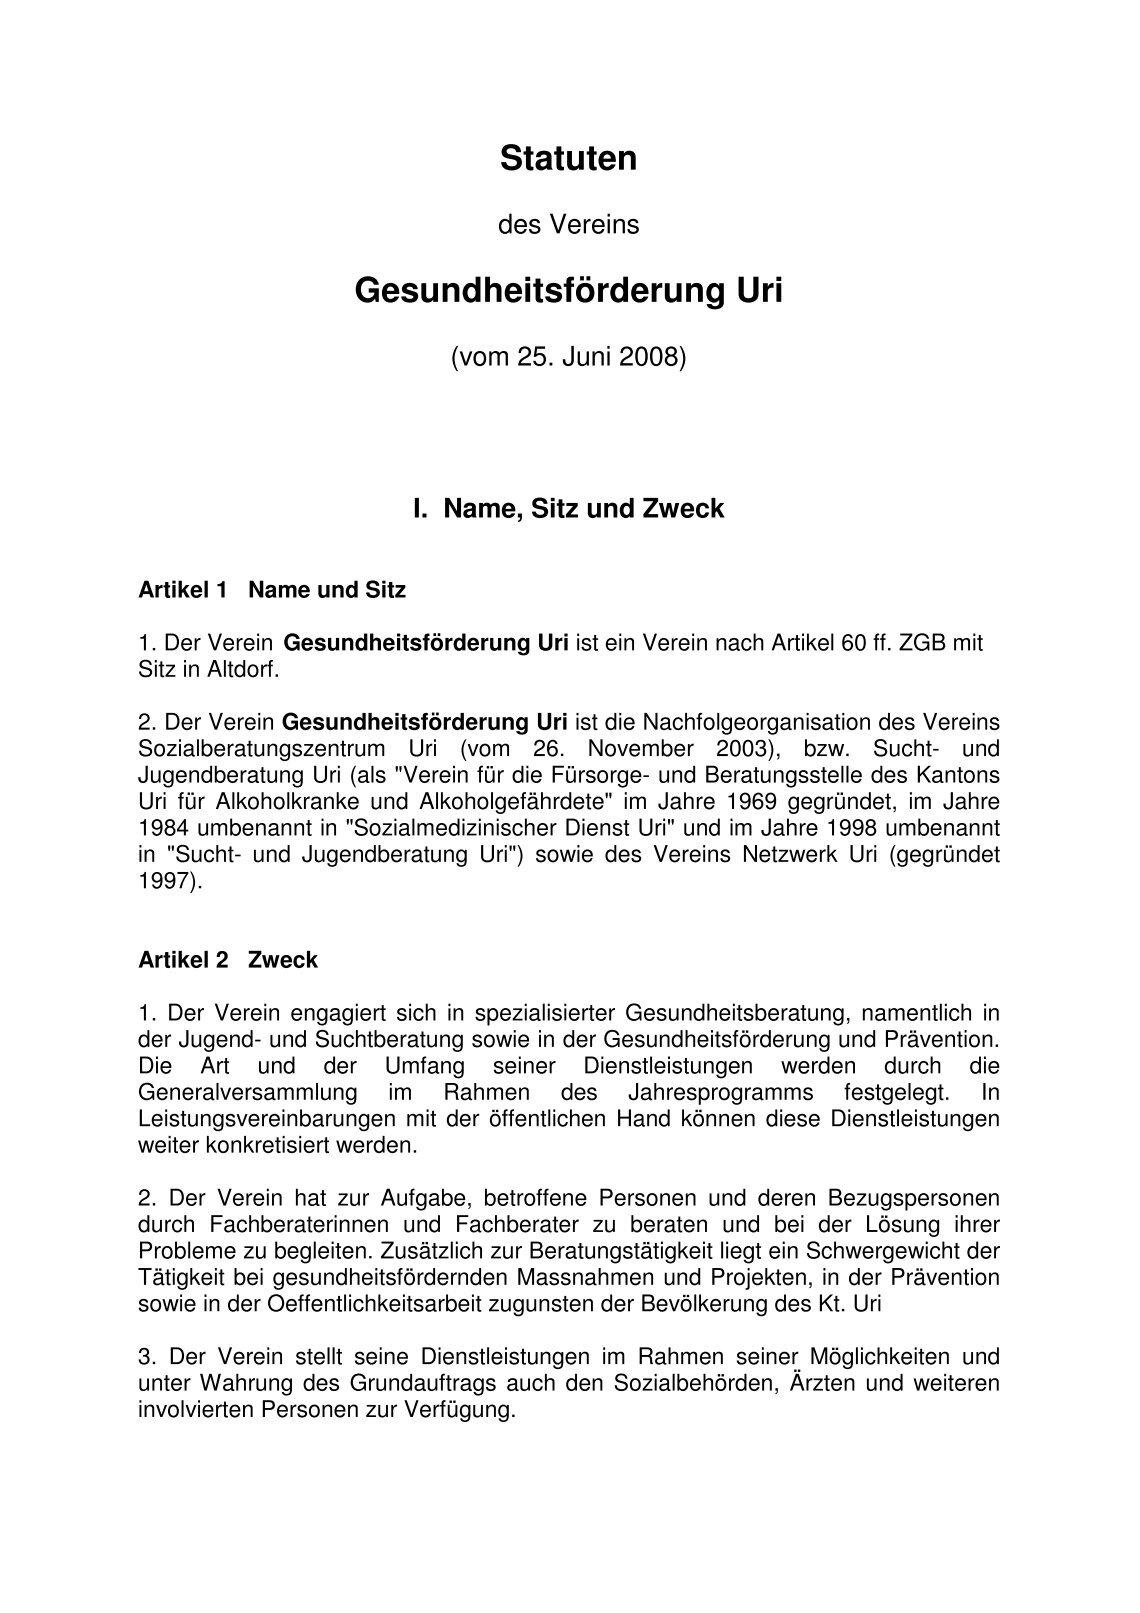 Groß Gleitstücke Shogun Rahmen Ideen - Rahmen Ideen ...